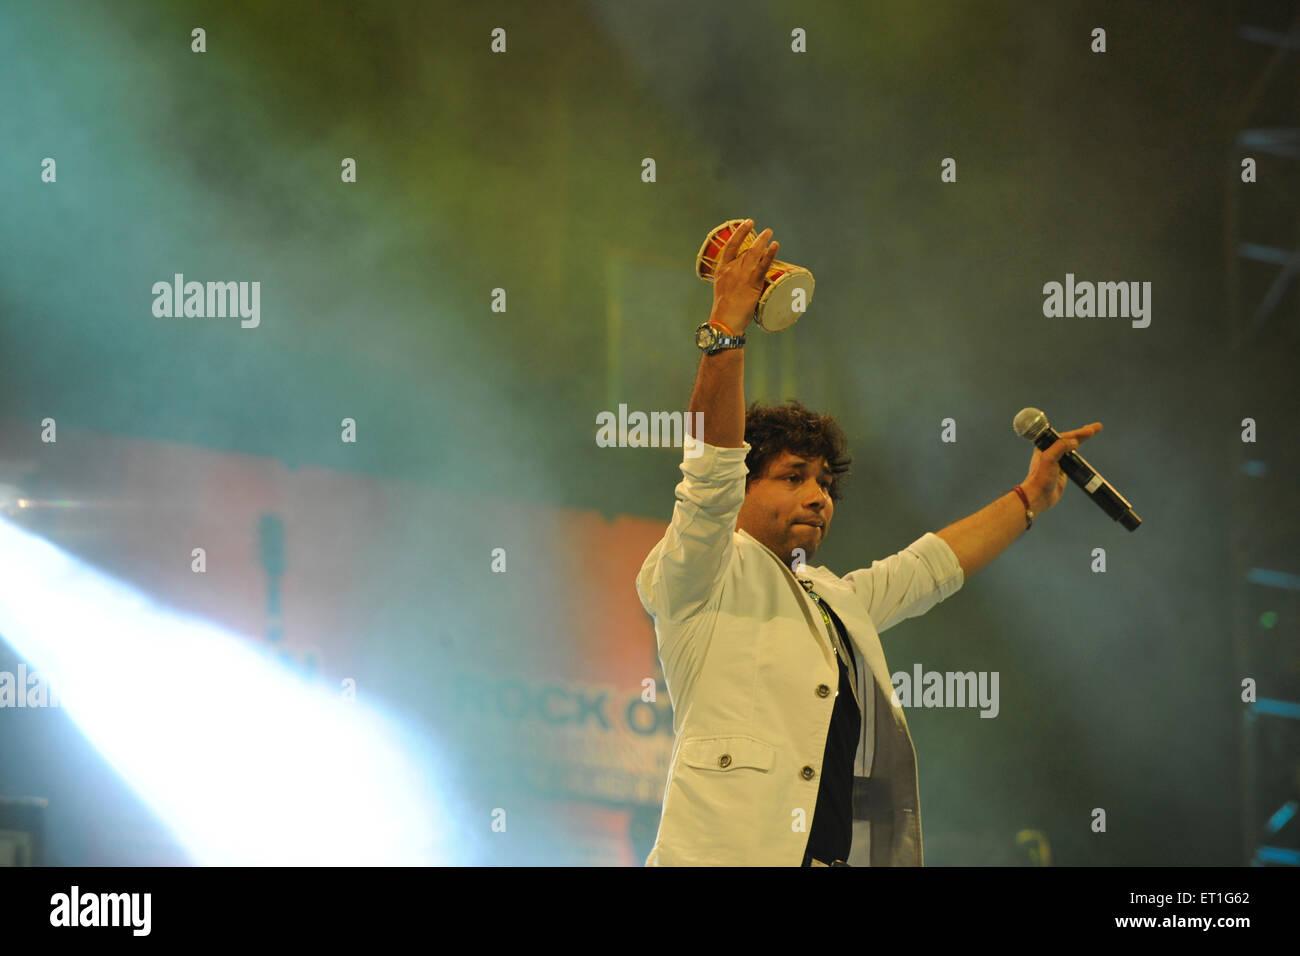 Kailash Kher singer of popular sufi music - Stock Image